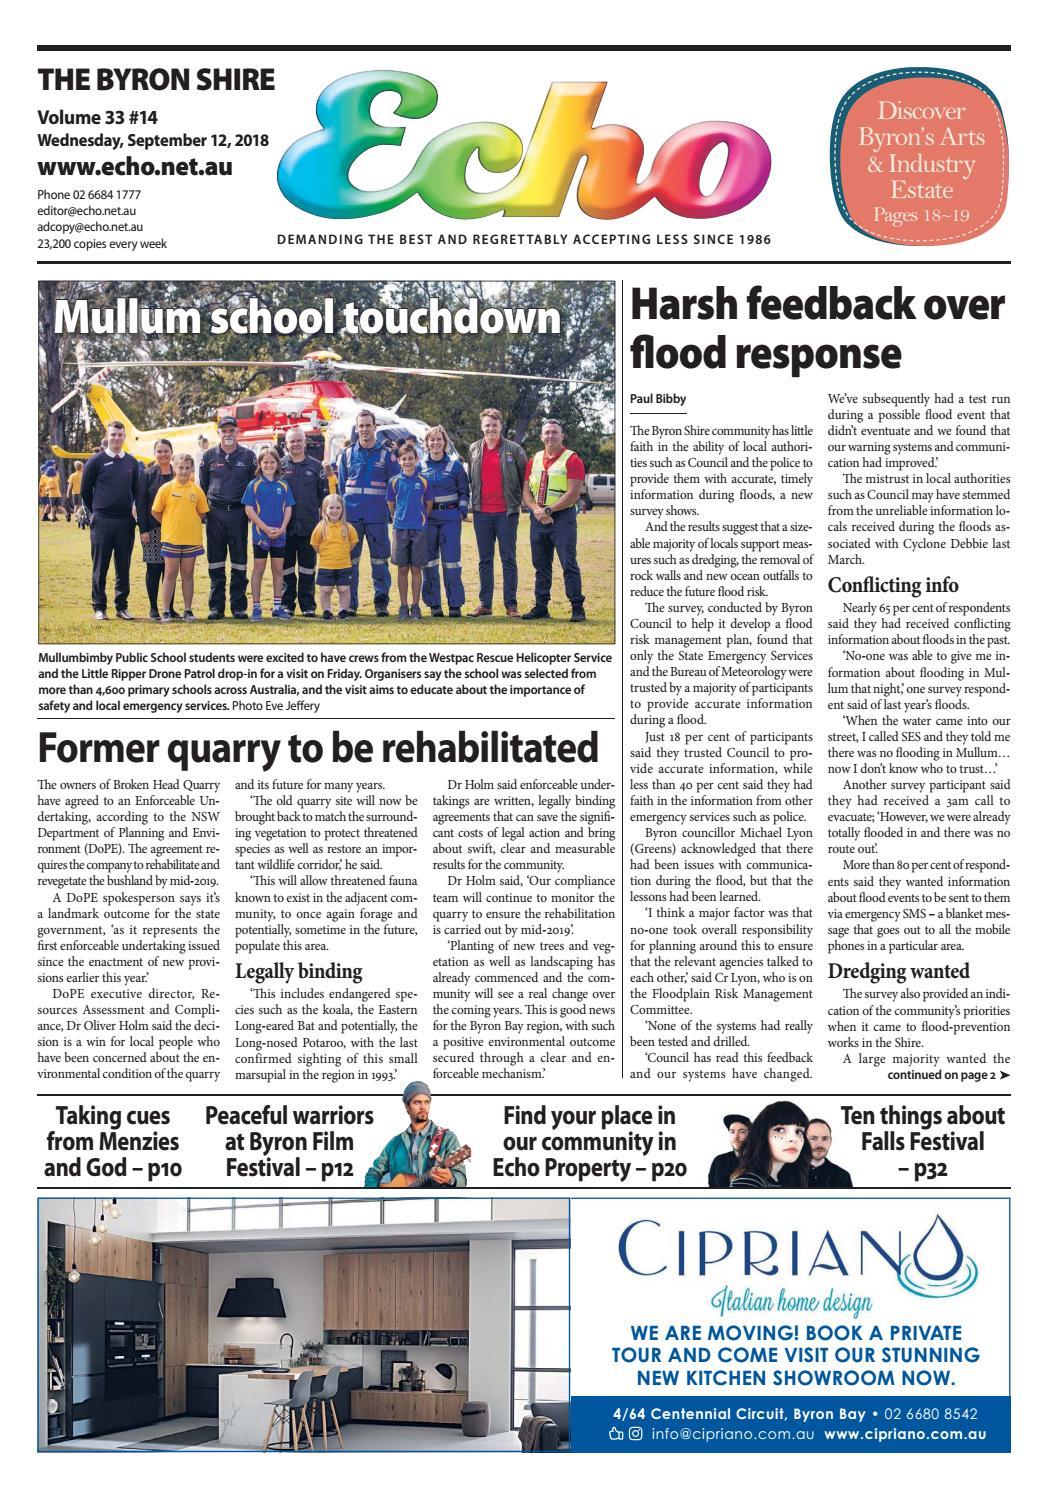 Fine The Byron Shire Echo Issue 33 14 September 12 2018 By Echo Wiring Cloud Gufailluminateatxorg